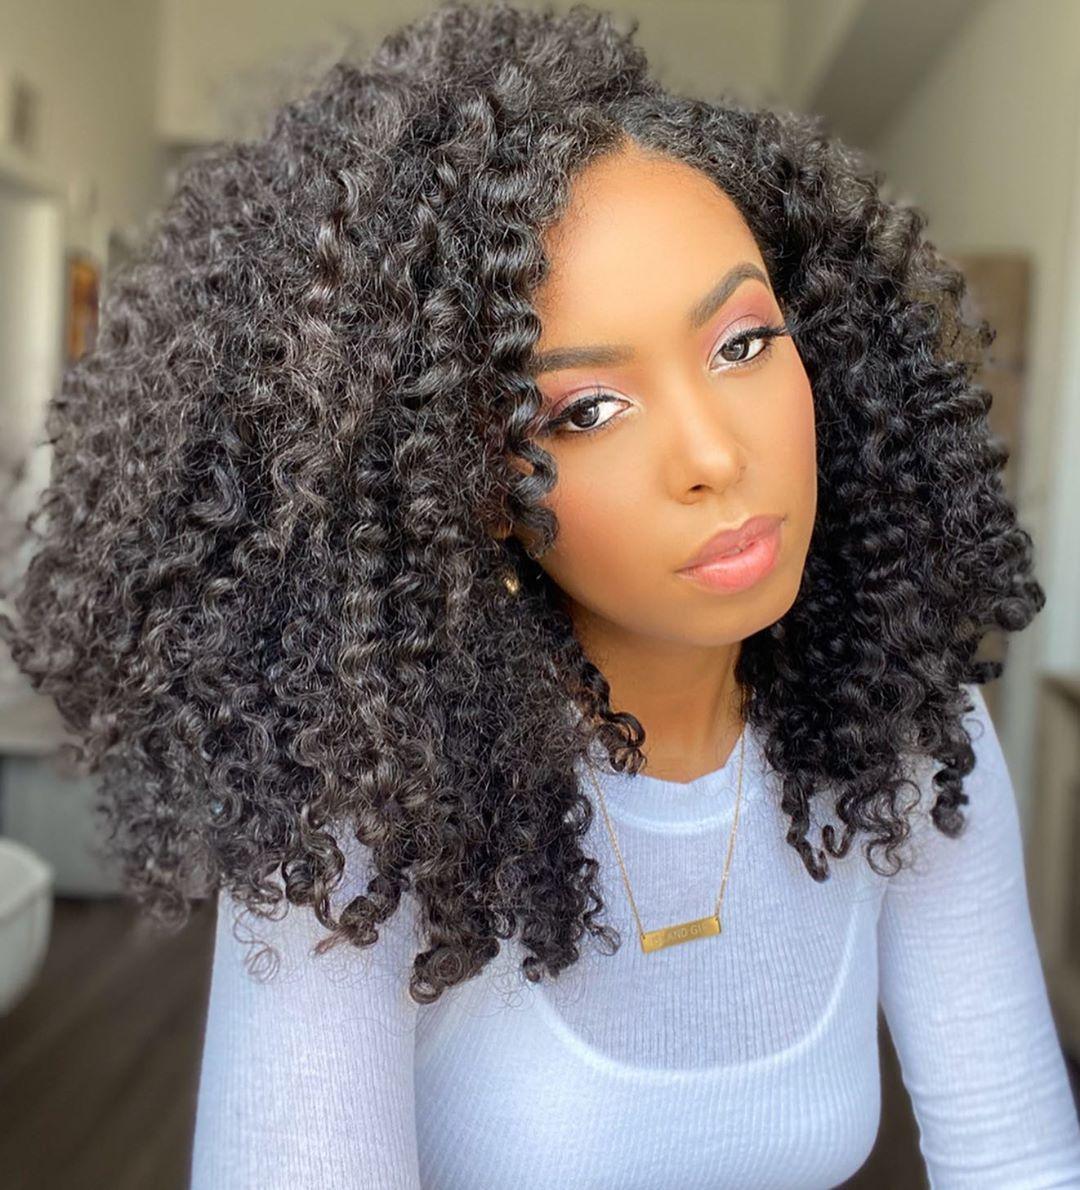 212 Likes 36 Comments Vanessa K Danishrolls On Instagram Hey Guys It S Your Girl Regina George On Braid Out Natural Hair Braid Out Natural Hair Styles